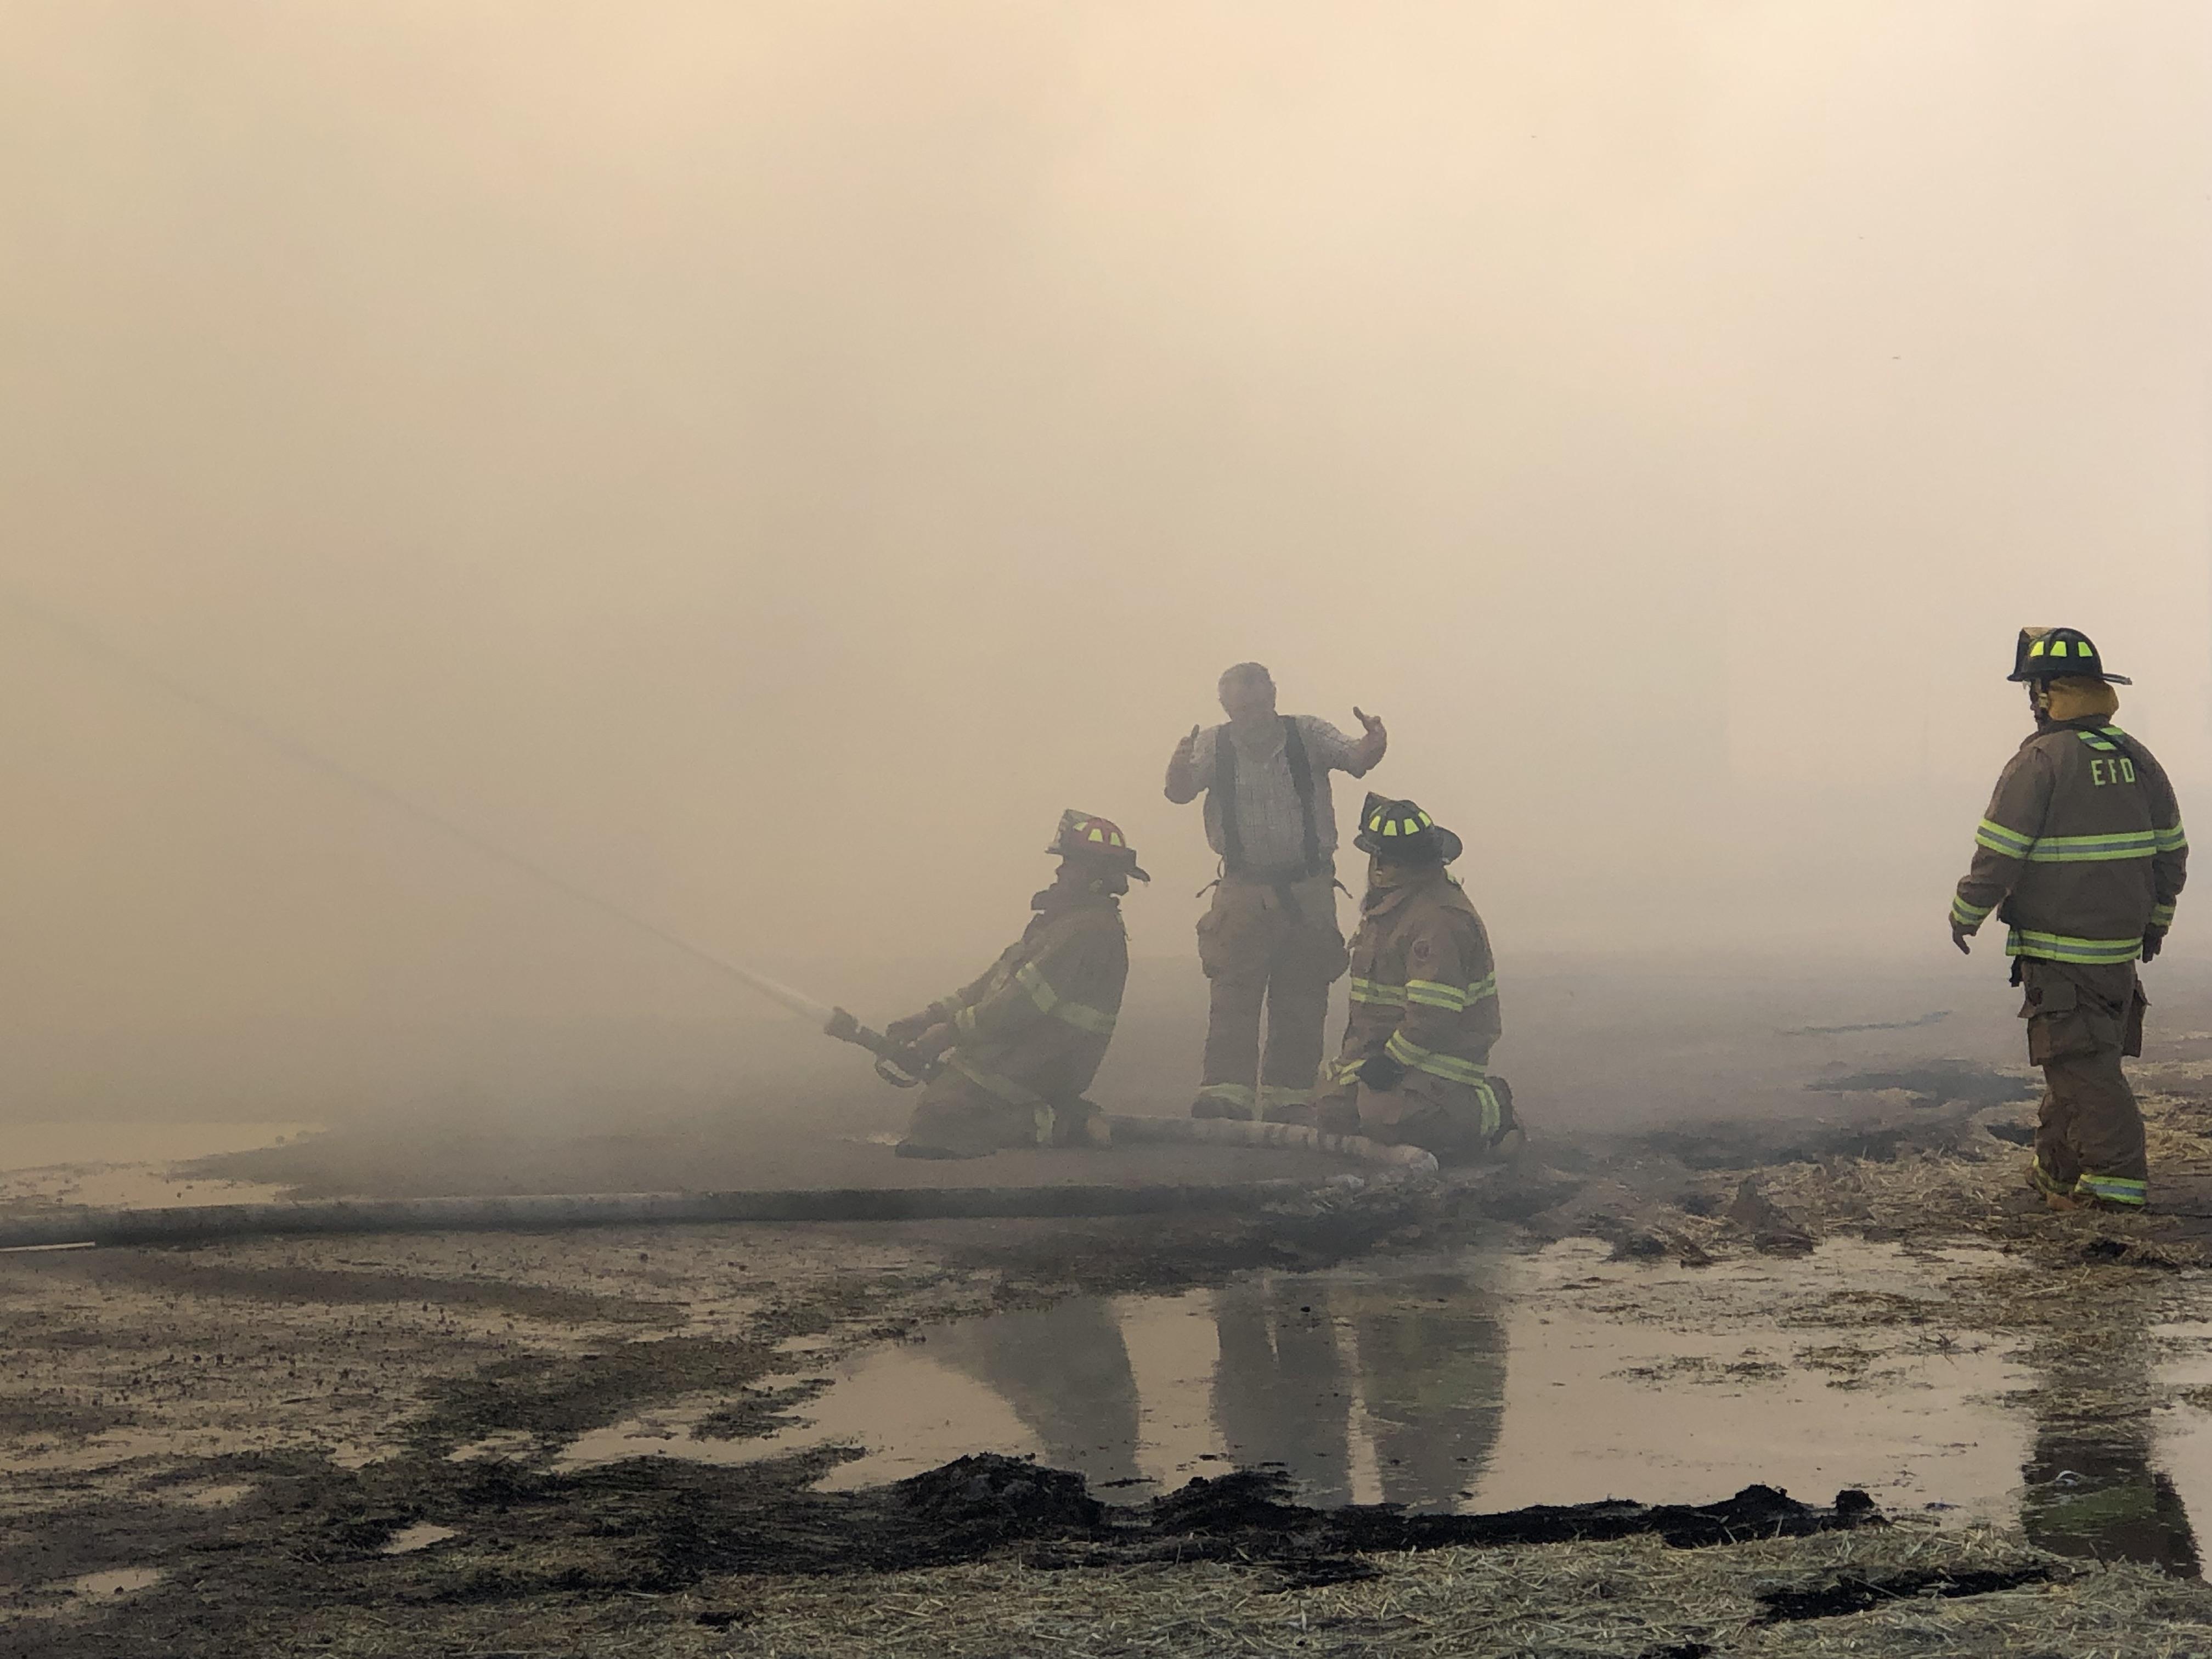 Fire engulfs hay barn in Beryl - St George News